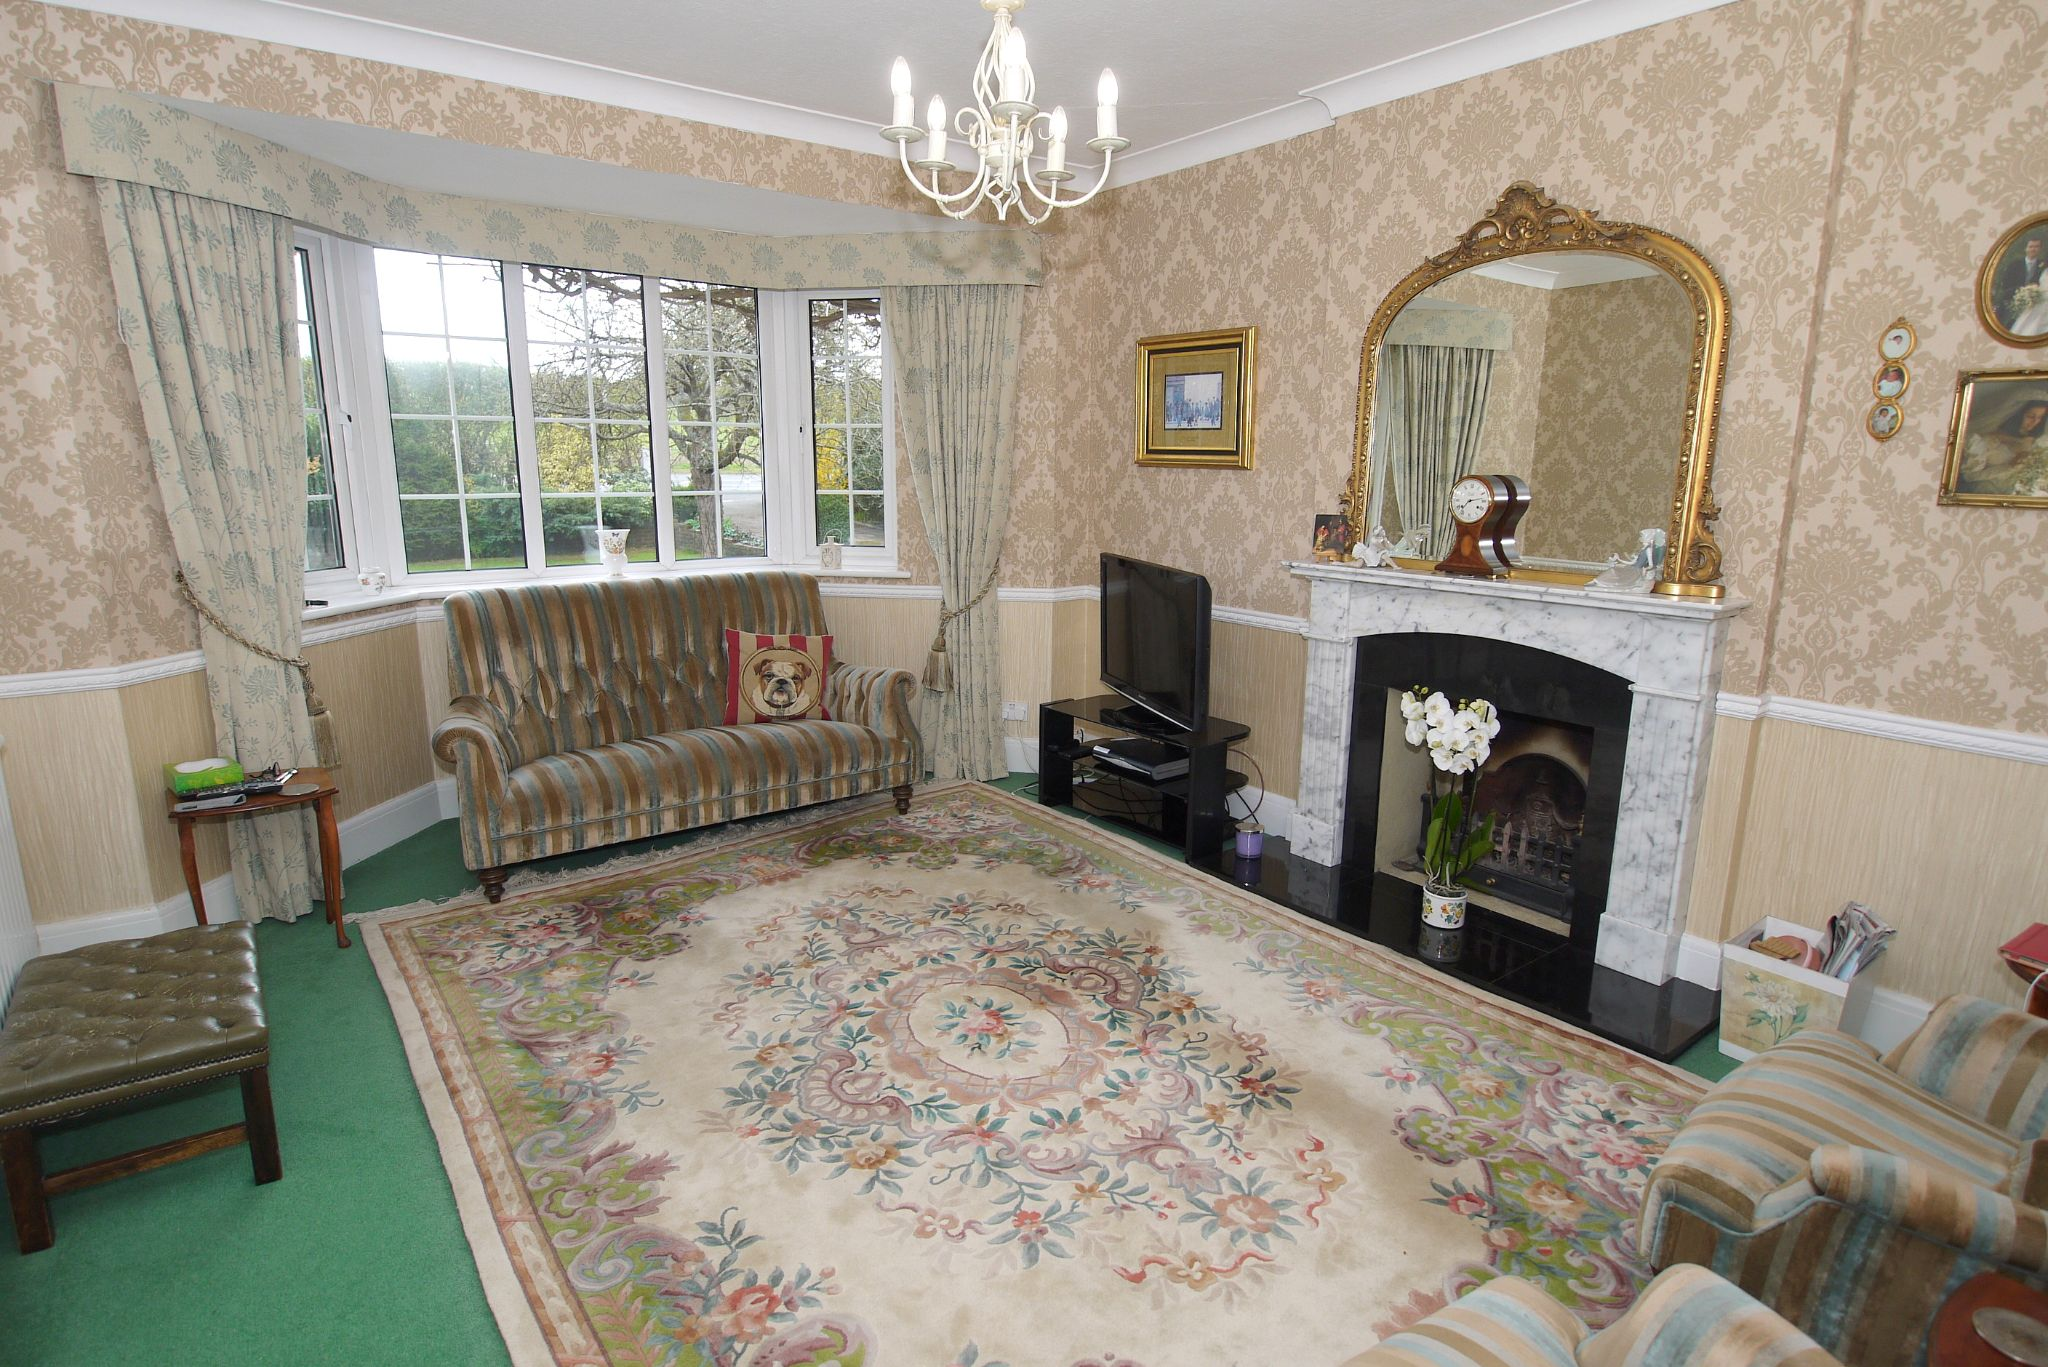 4 bedroom detached house Sold in Sevenoaks - Photograph 4